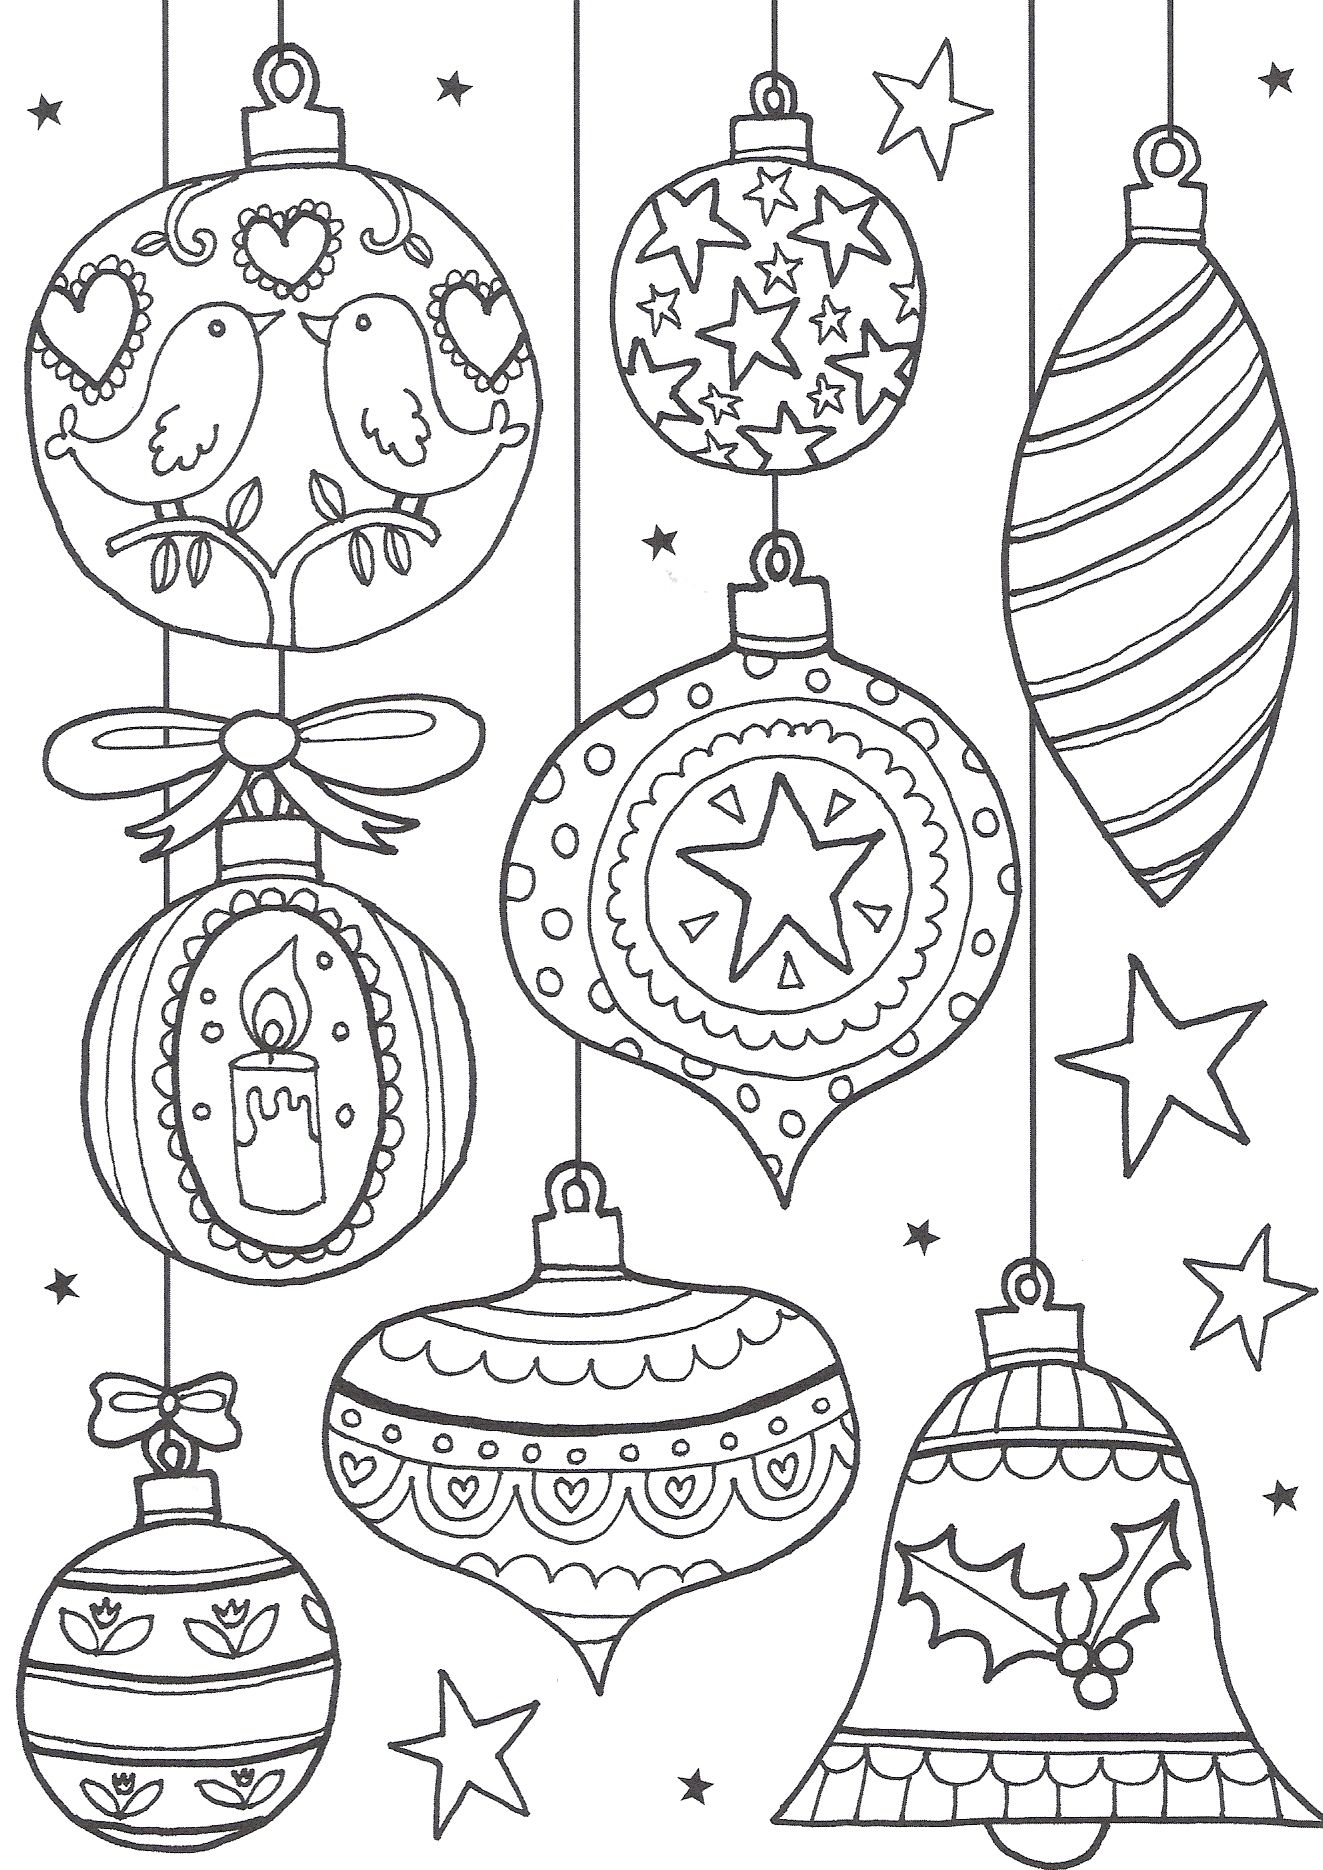 Kleurplaat  Free christmas coloring pages, Printable christmas